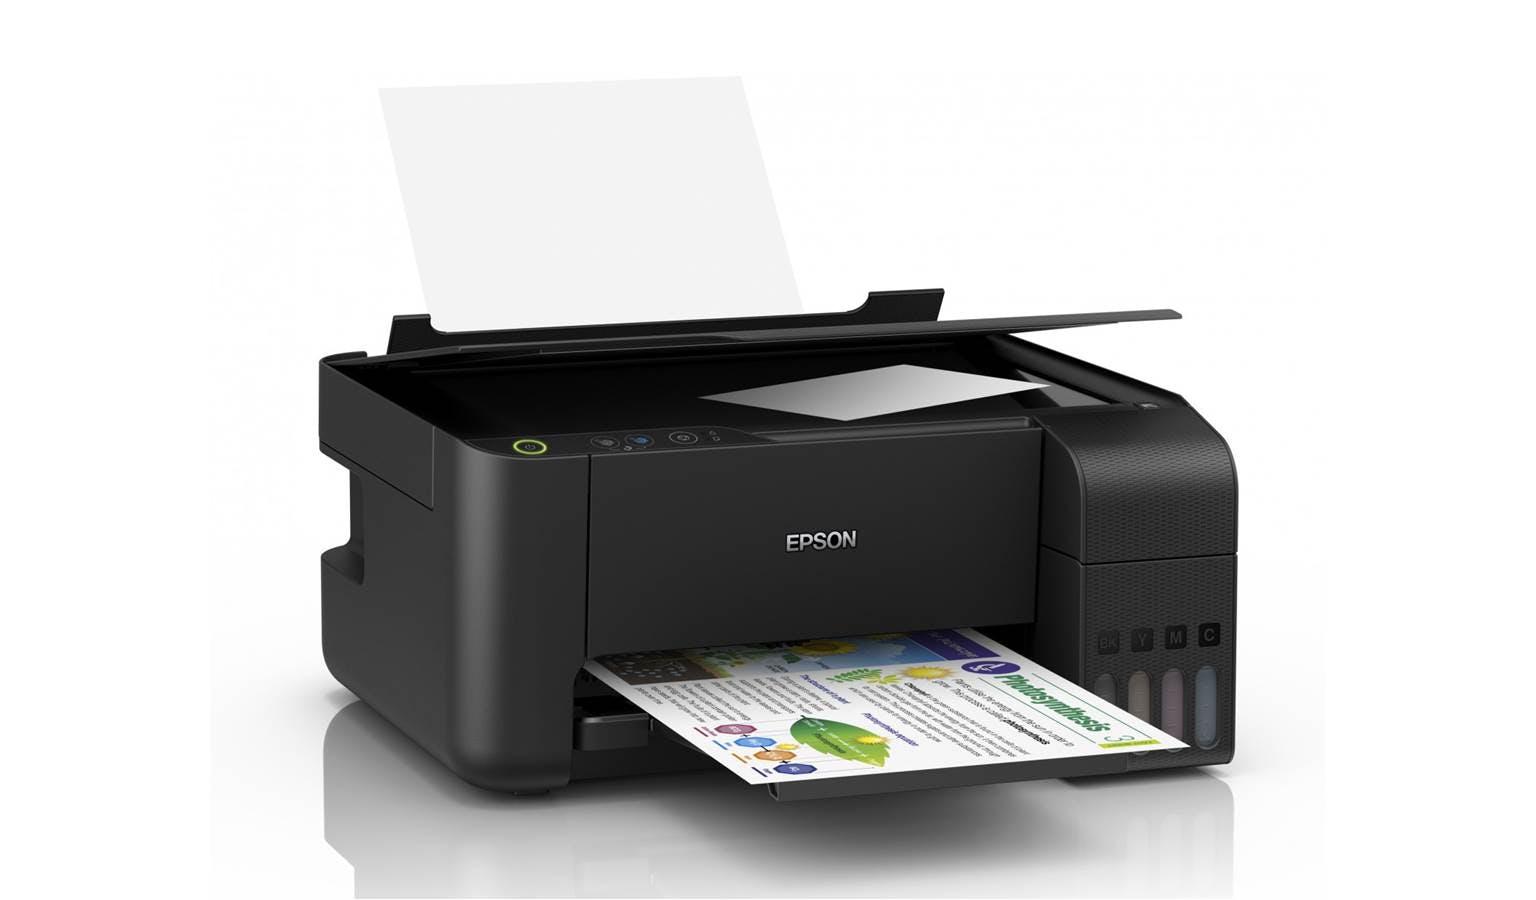 Epson EcoTank L3110 All-in-One Printer